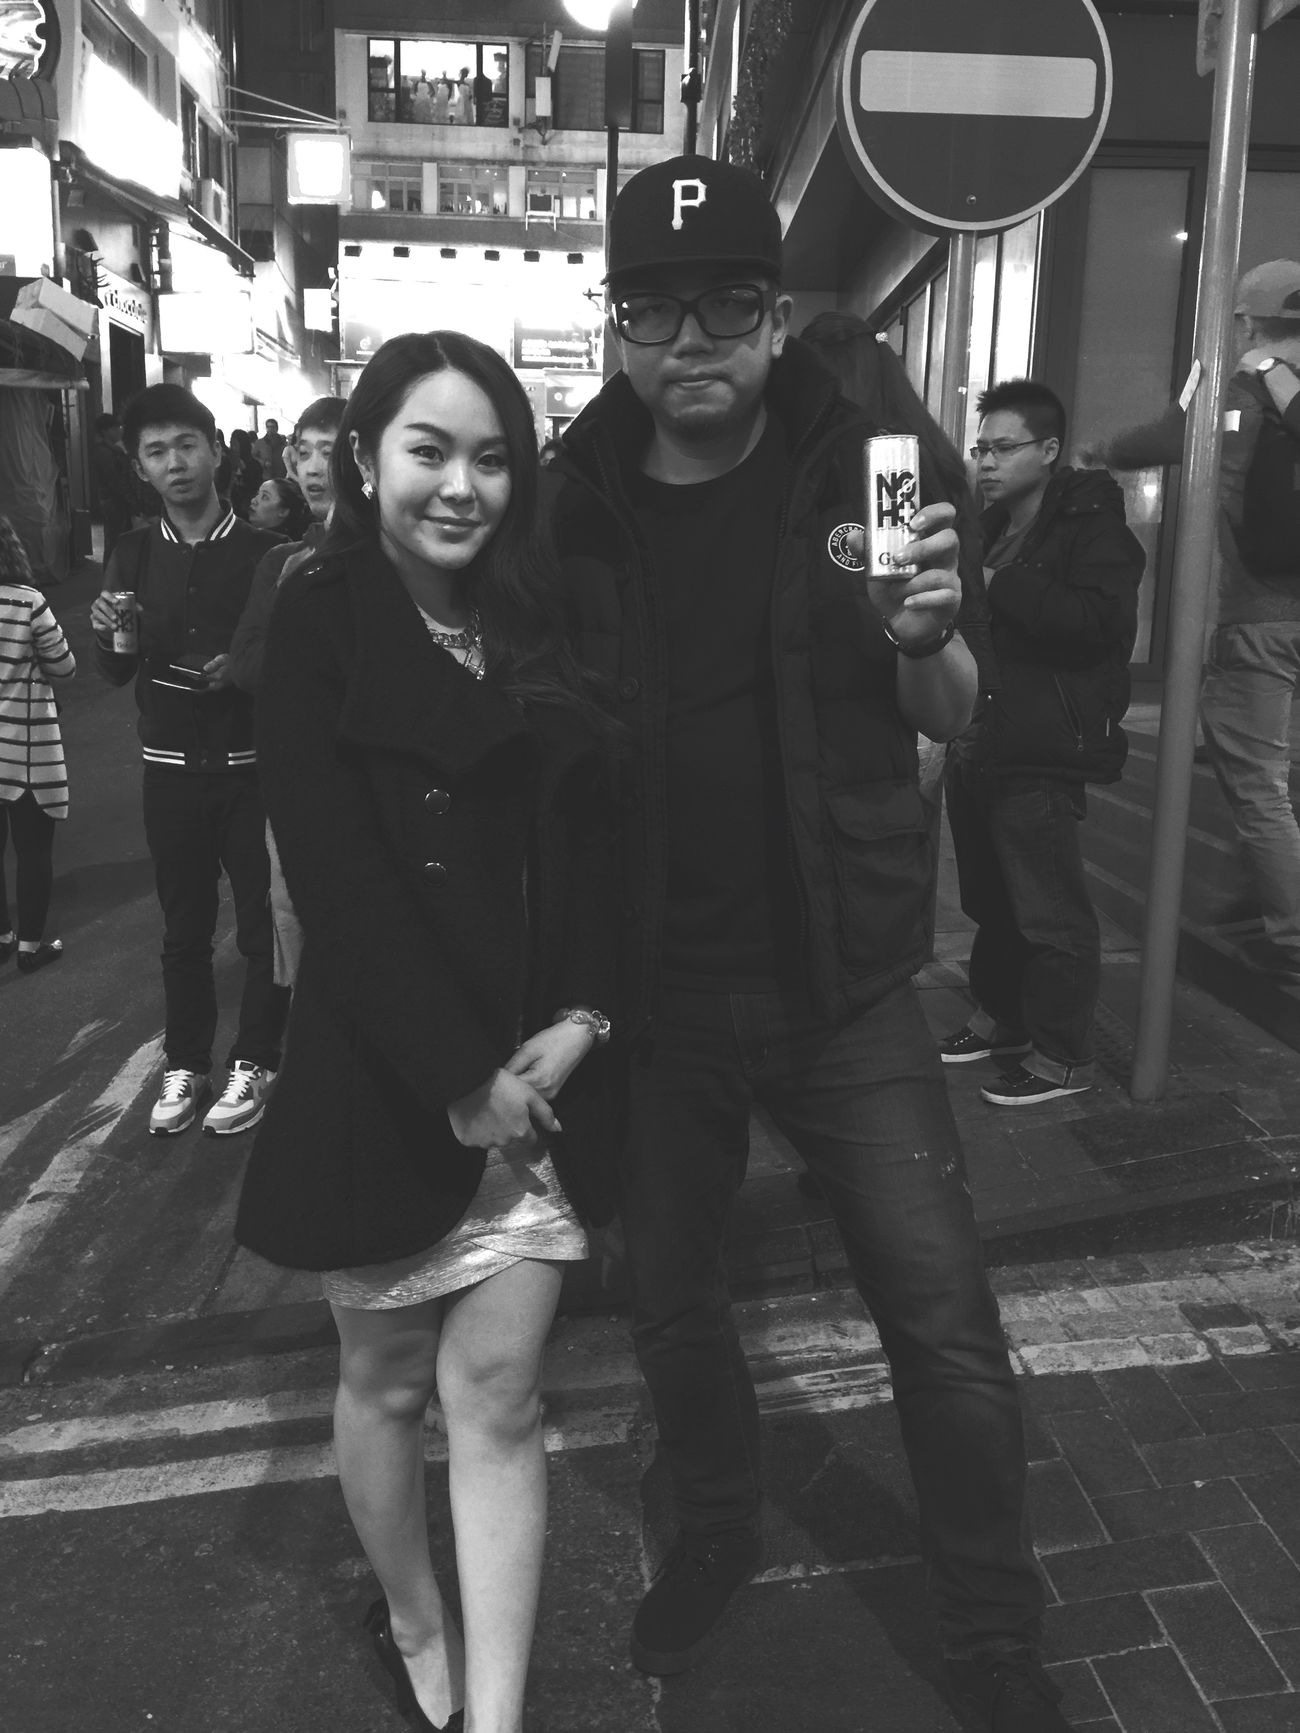 People Watching In Lan Kwai Fong In HK Have Fun I Love Hong Kong Taking Photo Its Me Lan Kwai Fong Have A Drink Have A Nice Day♥ Beautiful Girl